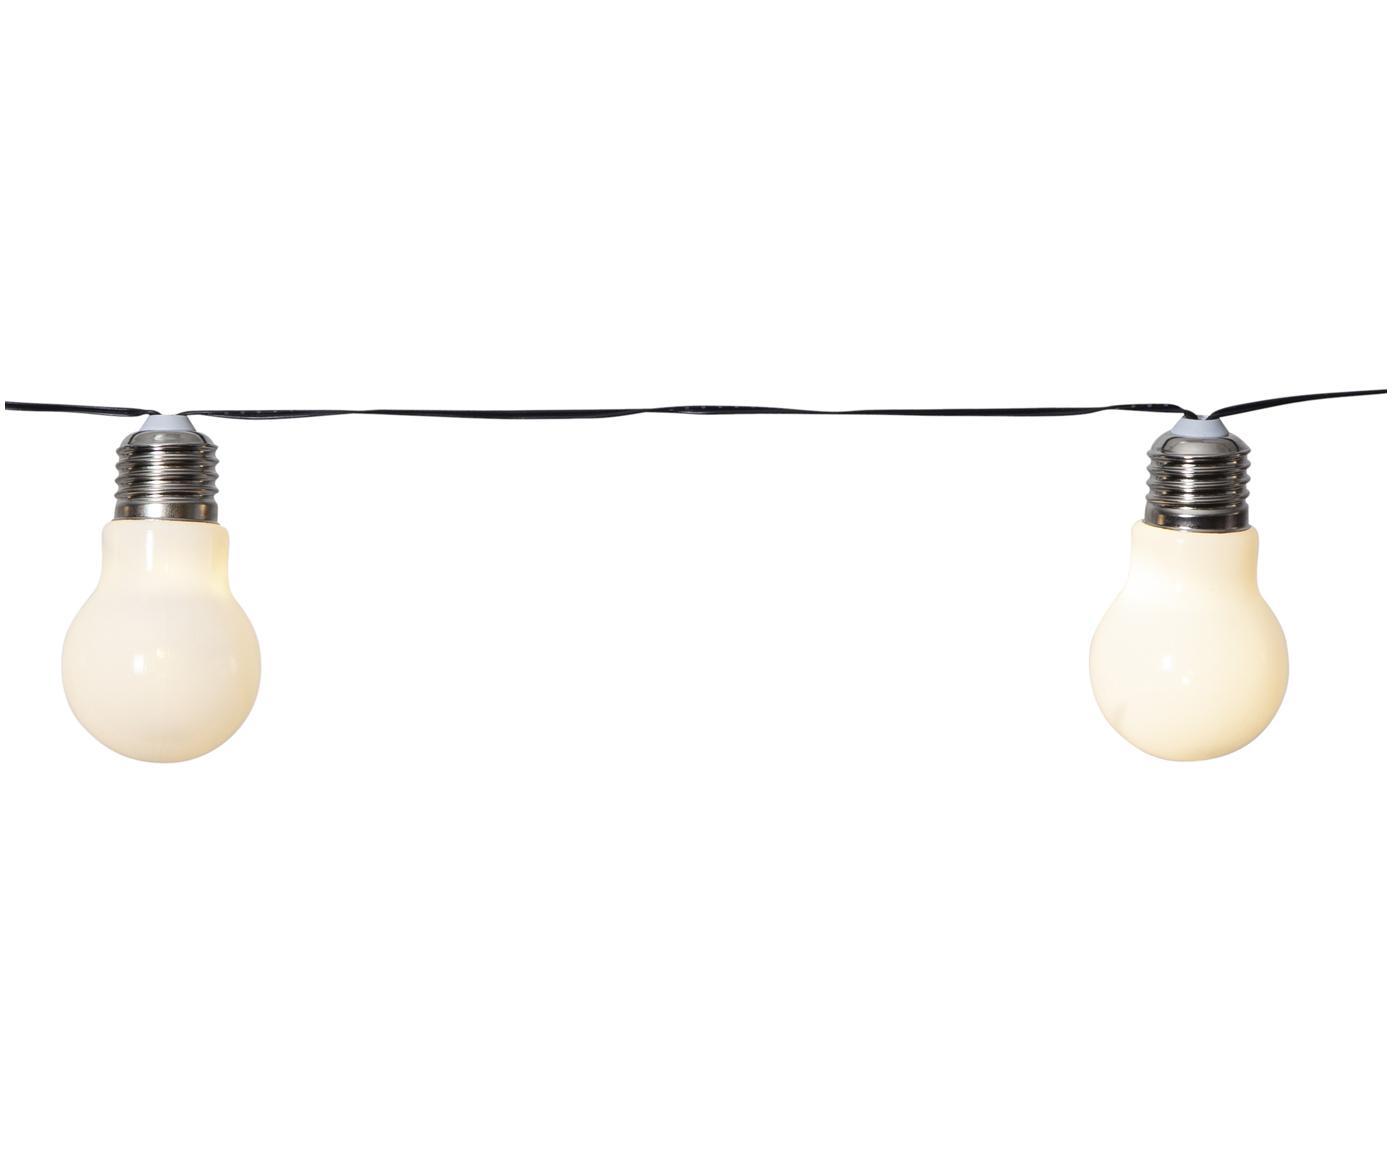 Ghirlanda  a LED Glow, 100 cm, Bianco, Lung. 100 cm